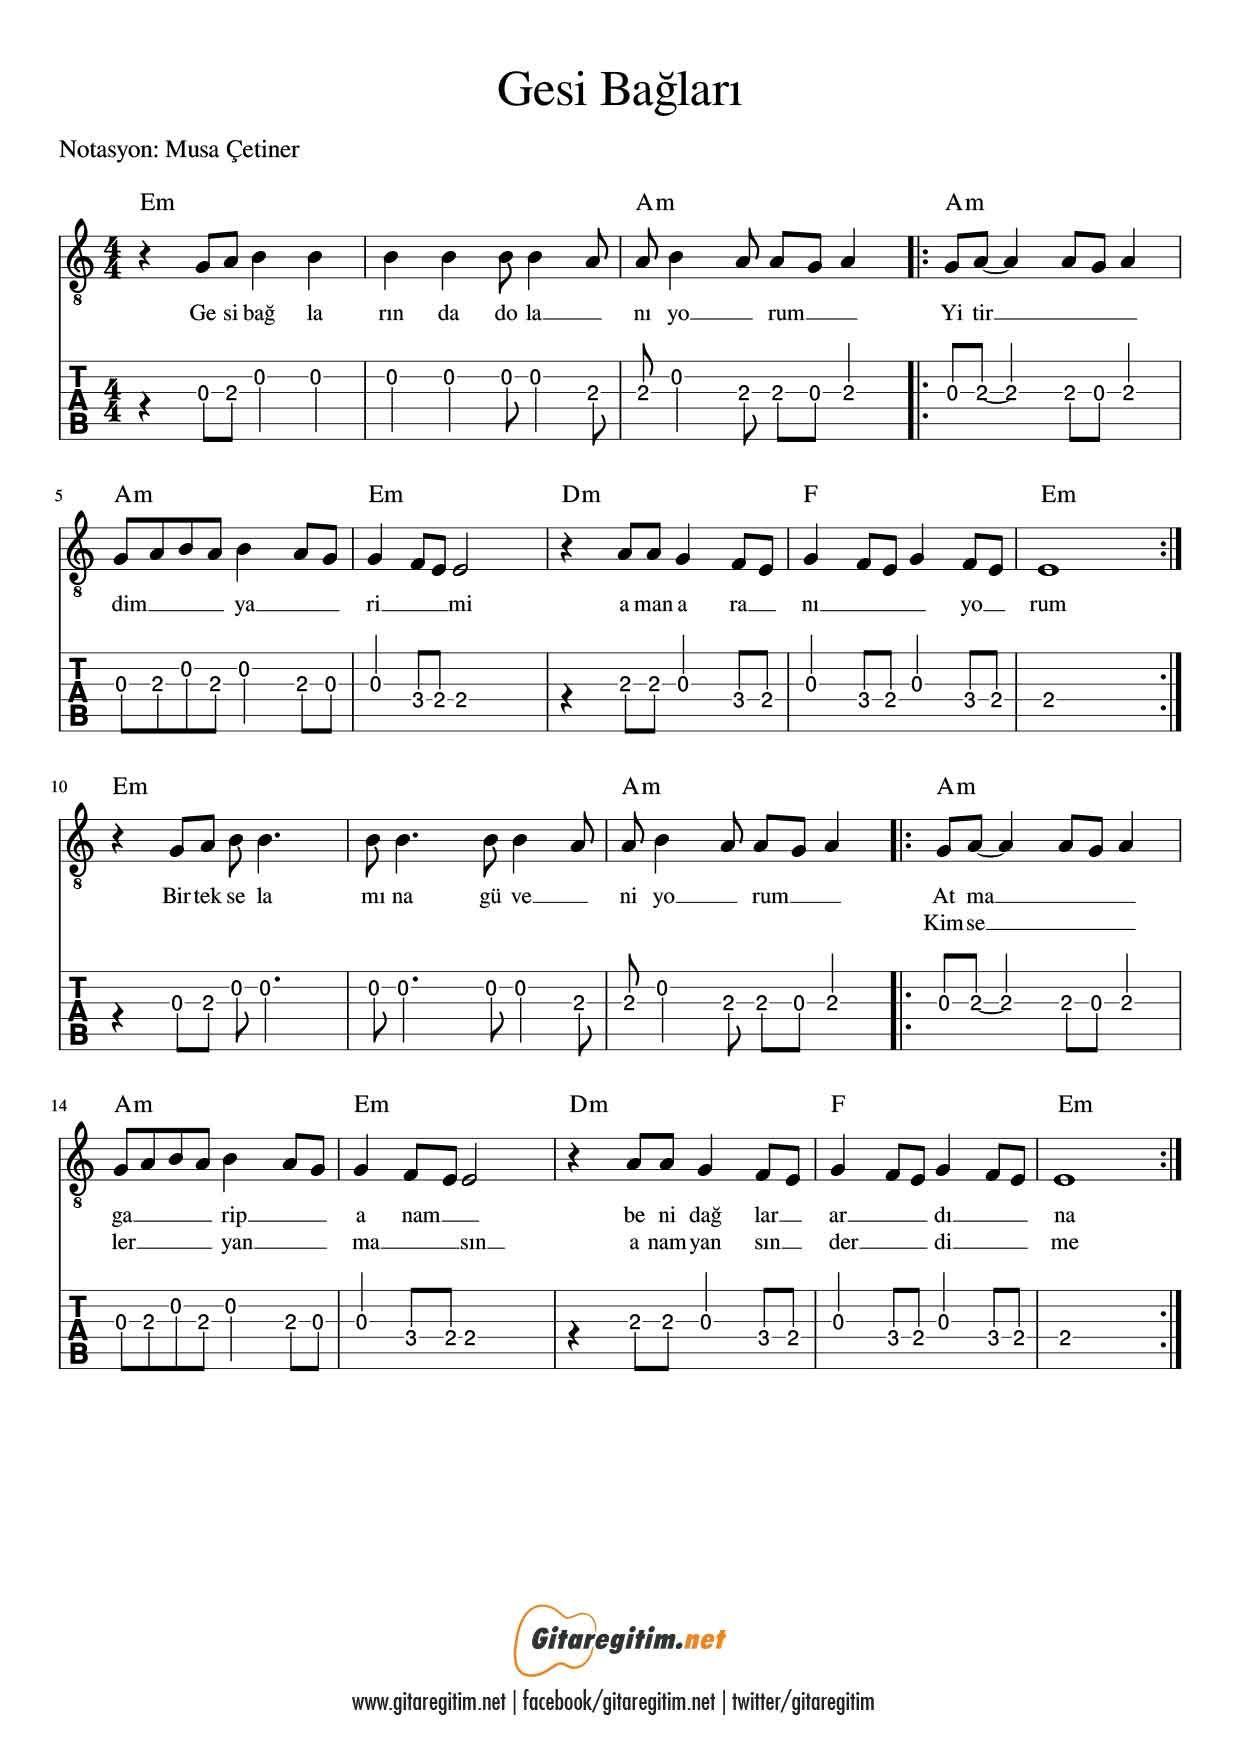 Gesi Baglari Gitar Nota Tab Gitaregitim Net Gitar Flut Notalara Dokulmus Muzik